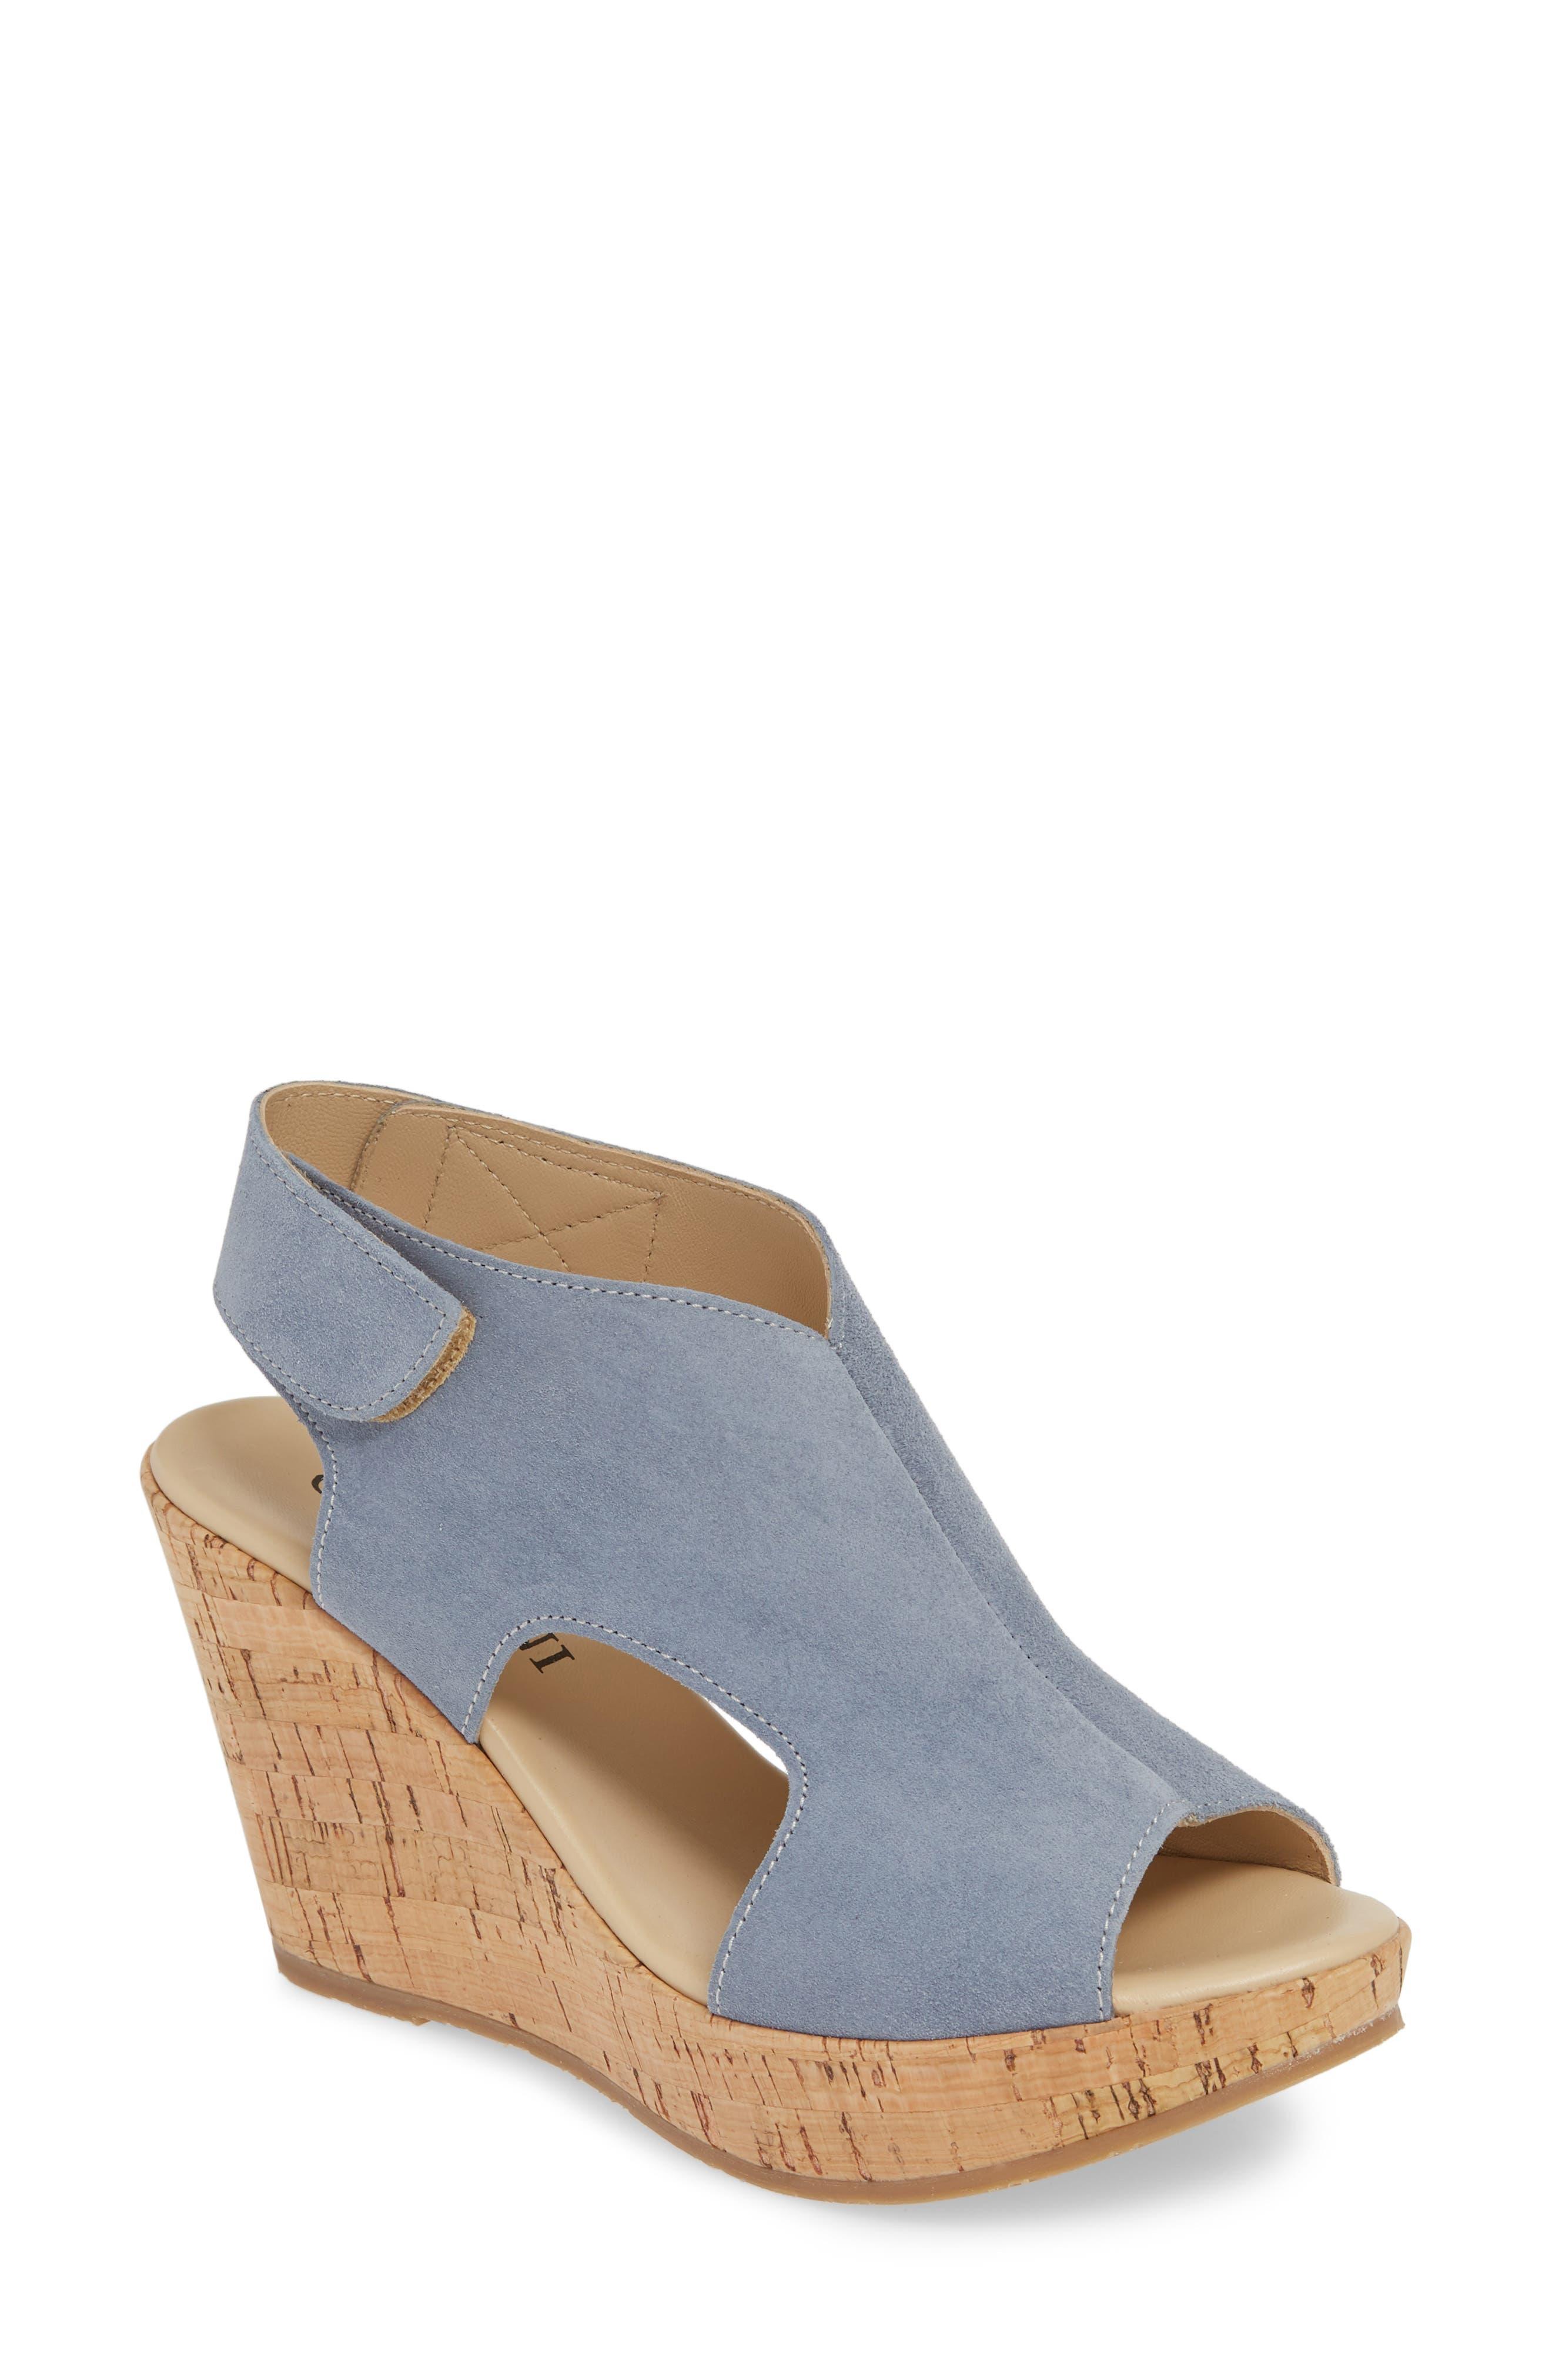 Cordani Reed Wedge Sandal - Blue